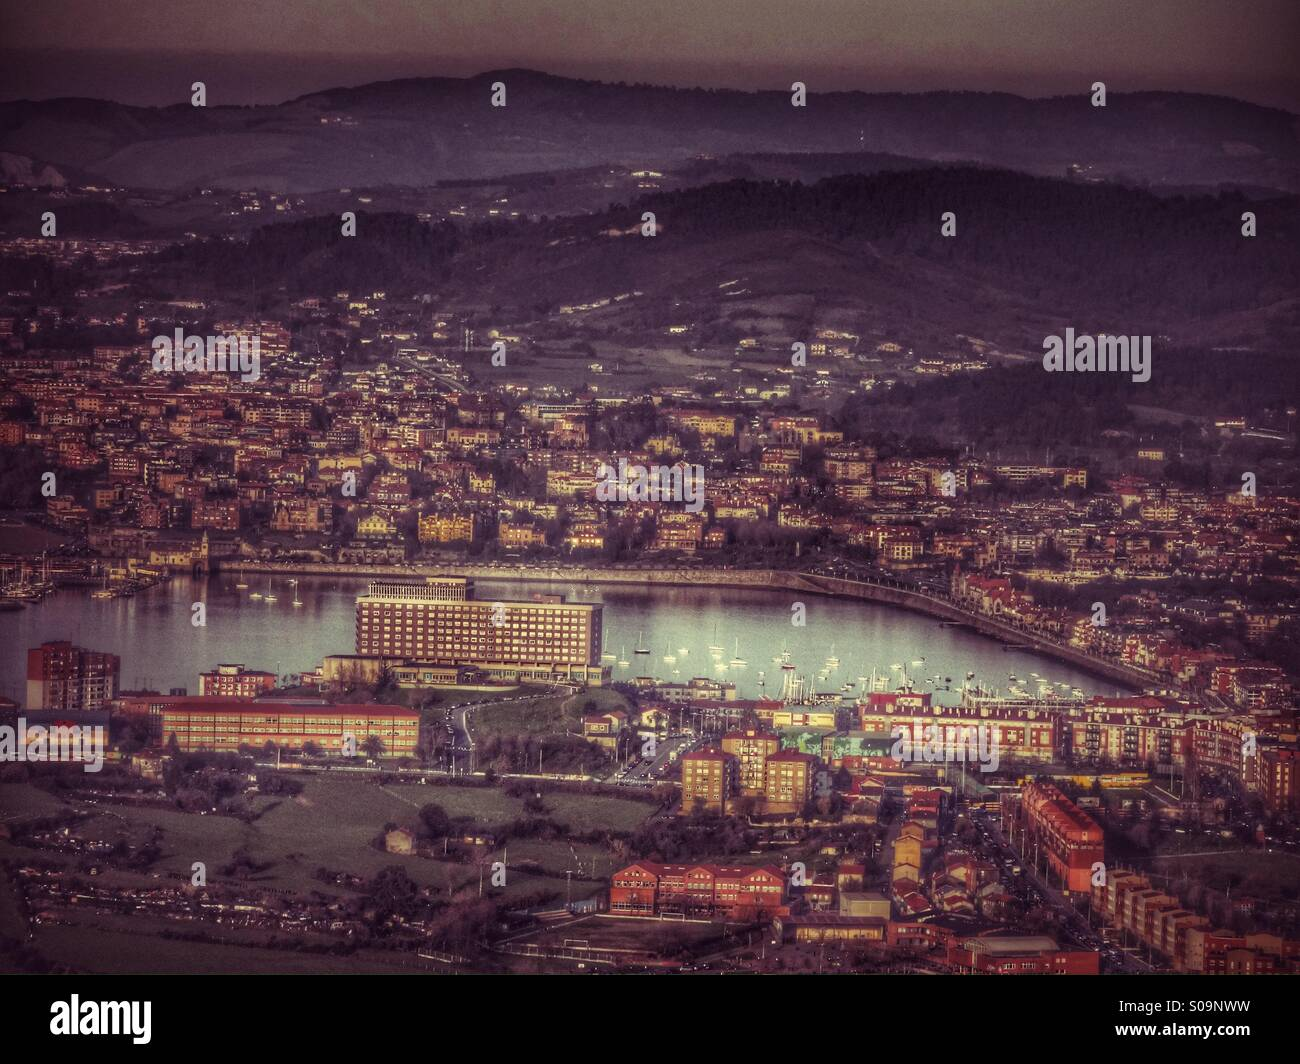 City, mountain, sea and sailing boats - Stock Image